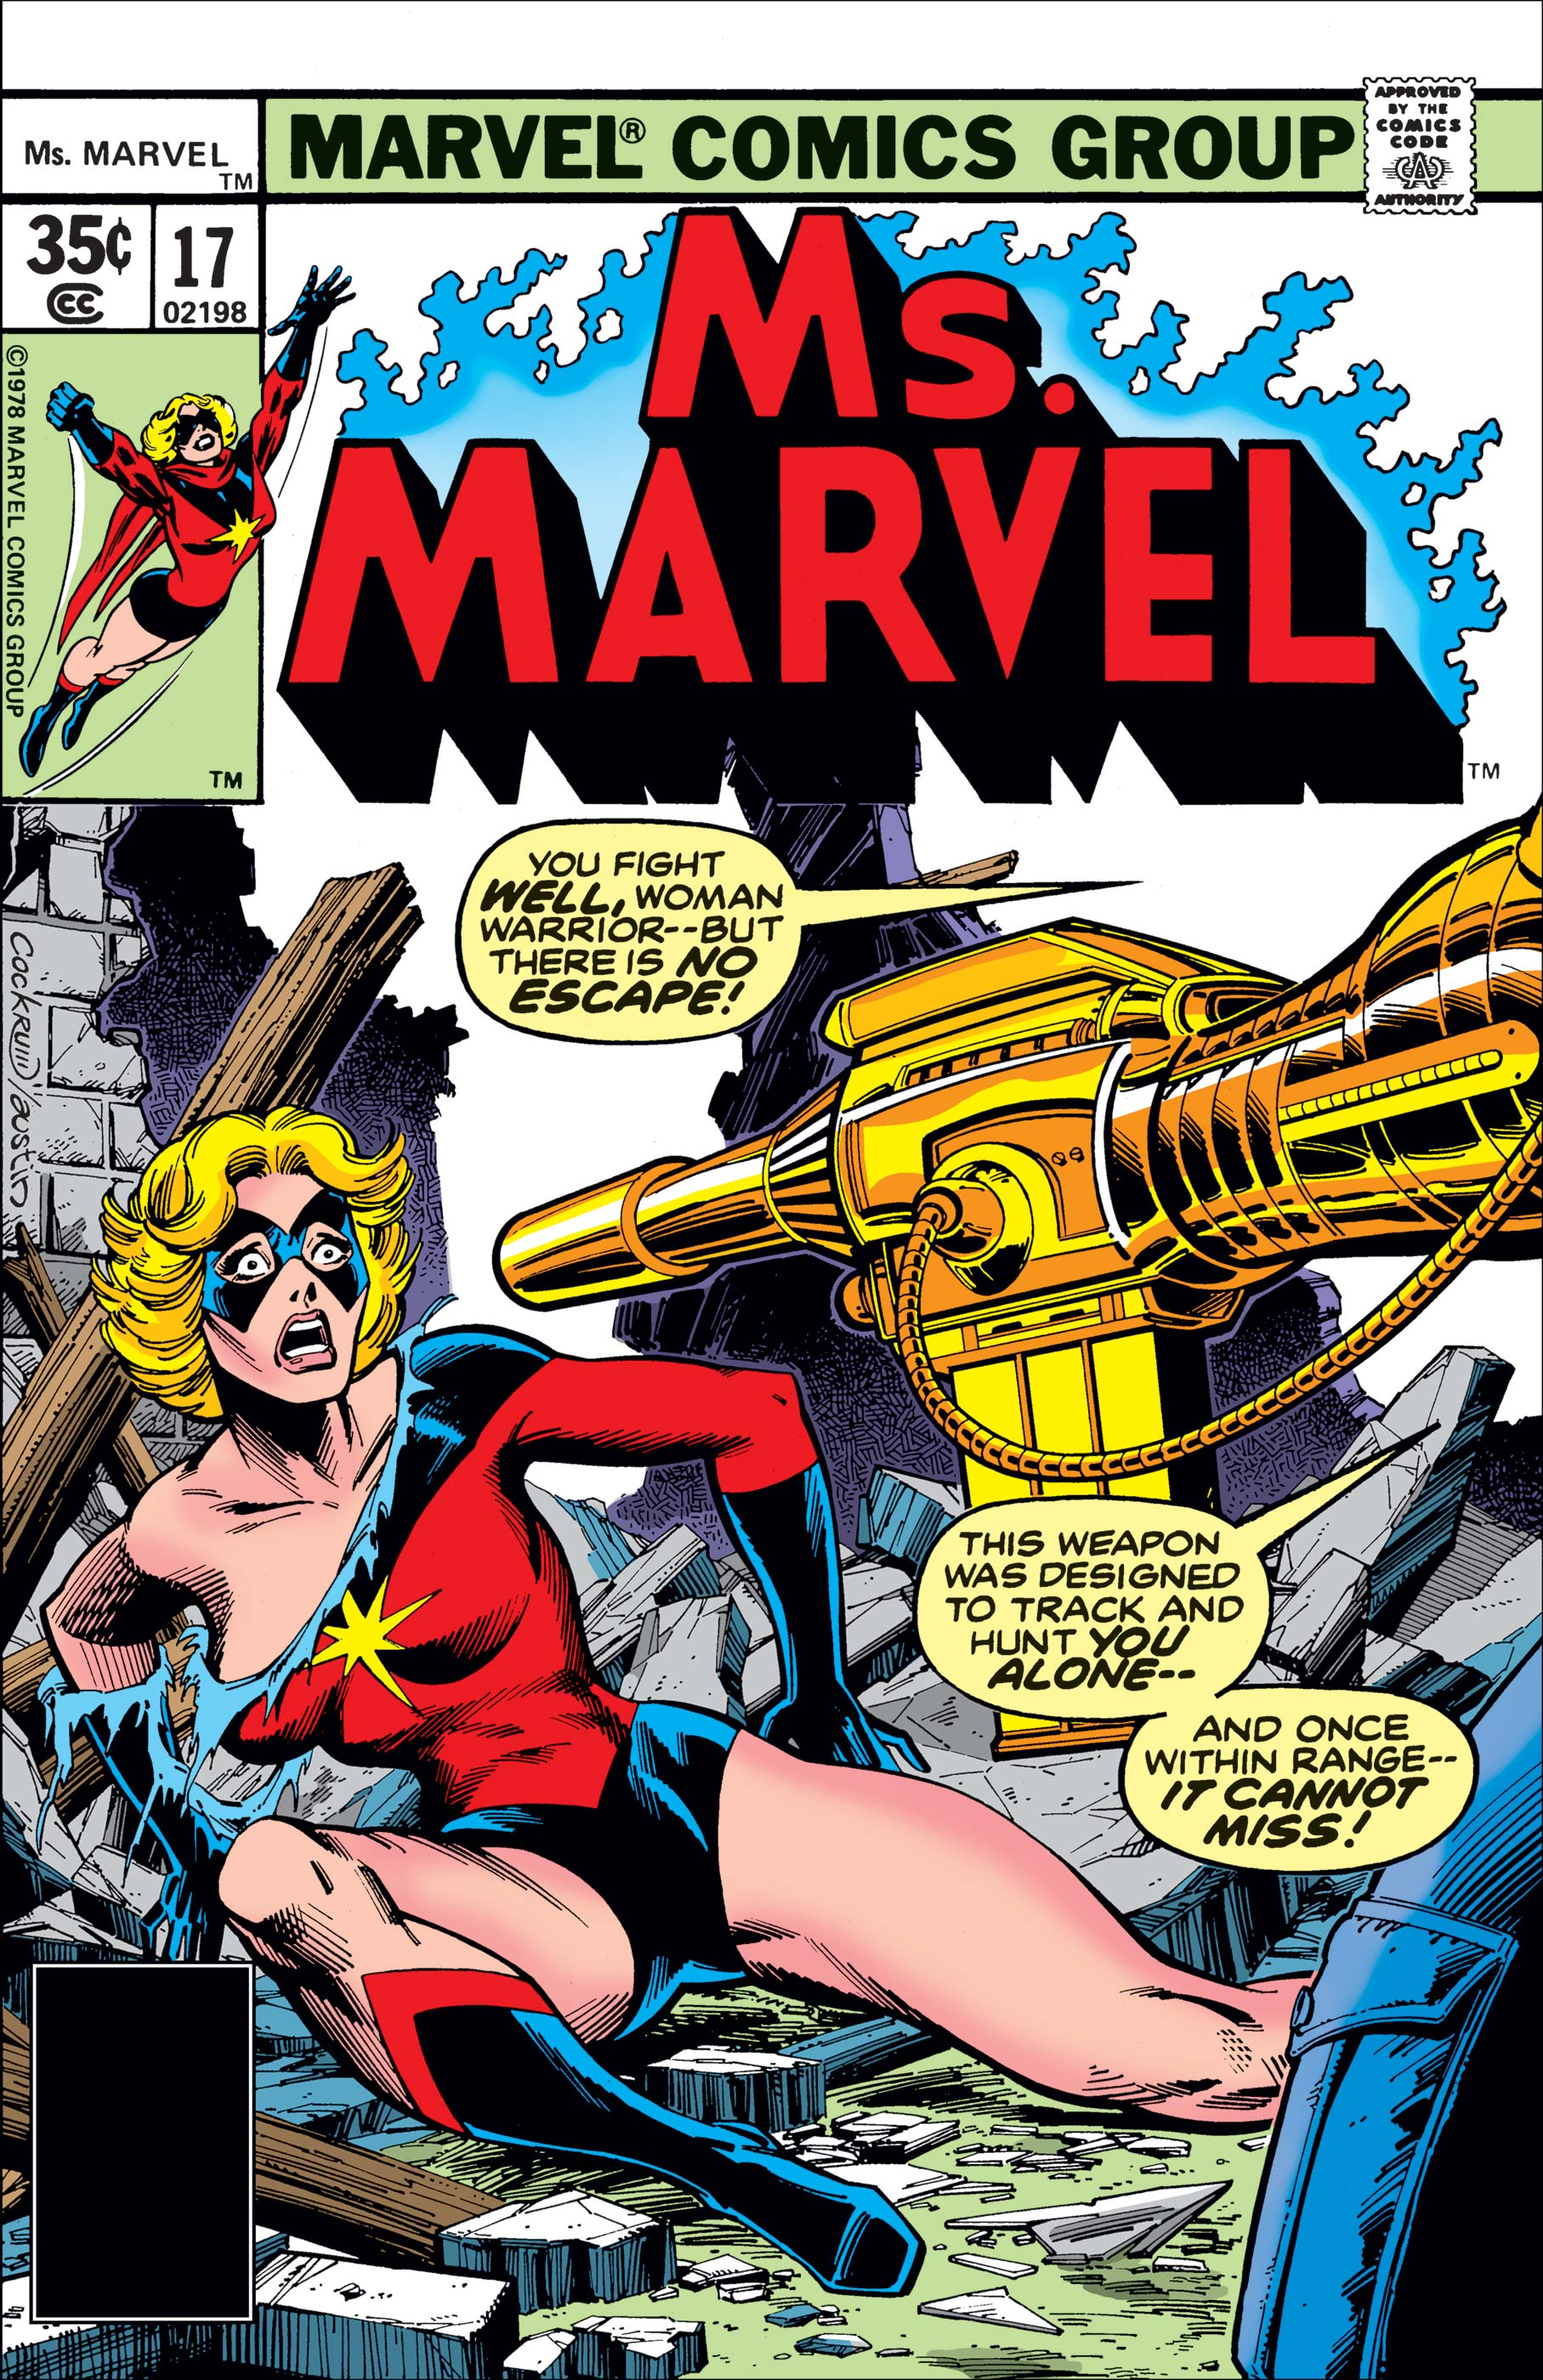 Ms. Marvel (1977) #17